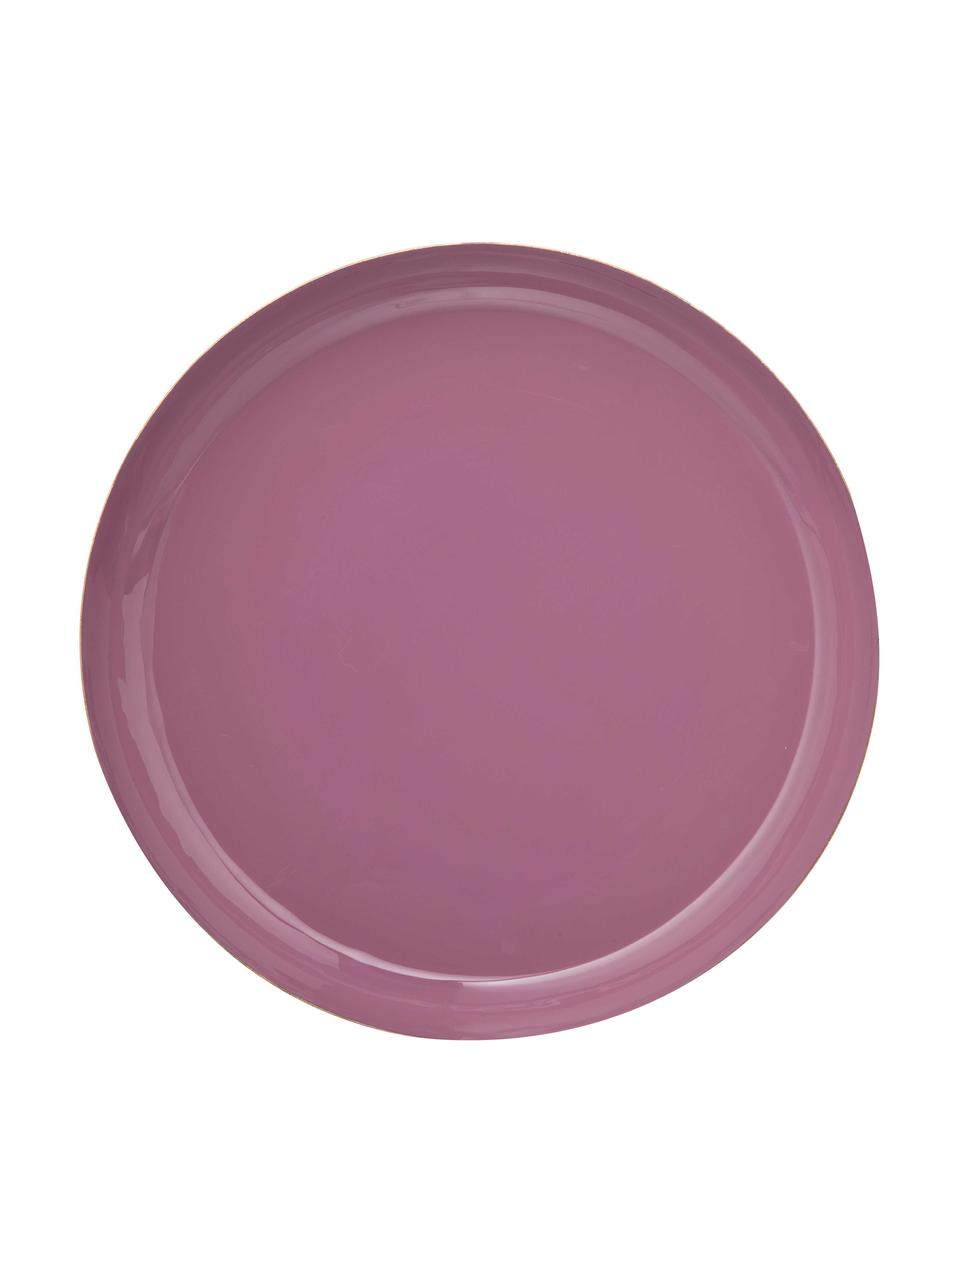 Deko-Tablett-Set Minella, 3-tlg., Metall, lackiert, Lila, Pink, RosaRand: Goldfarben, Sondergrößen